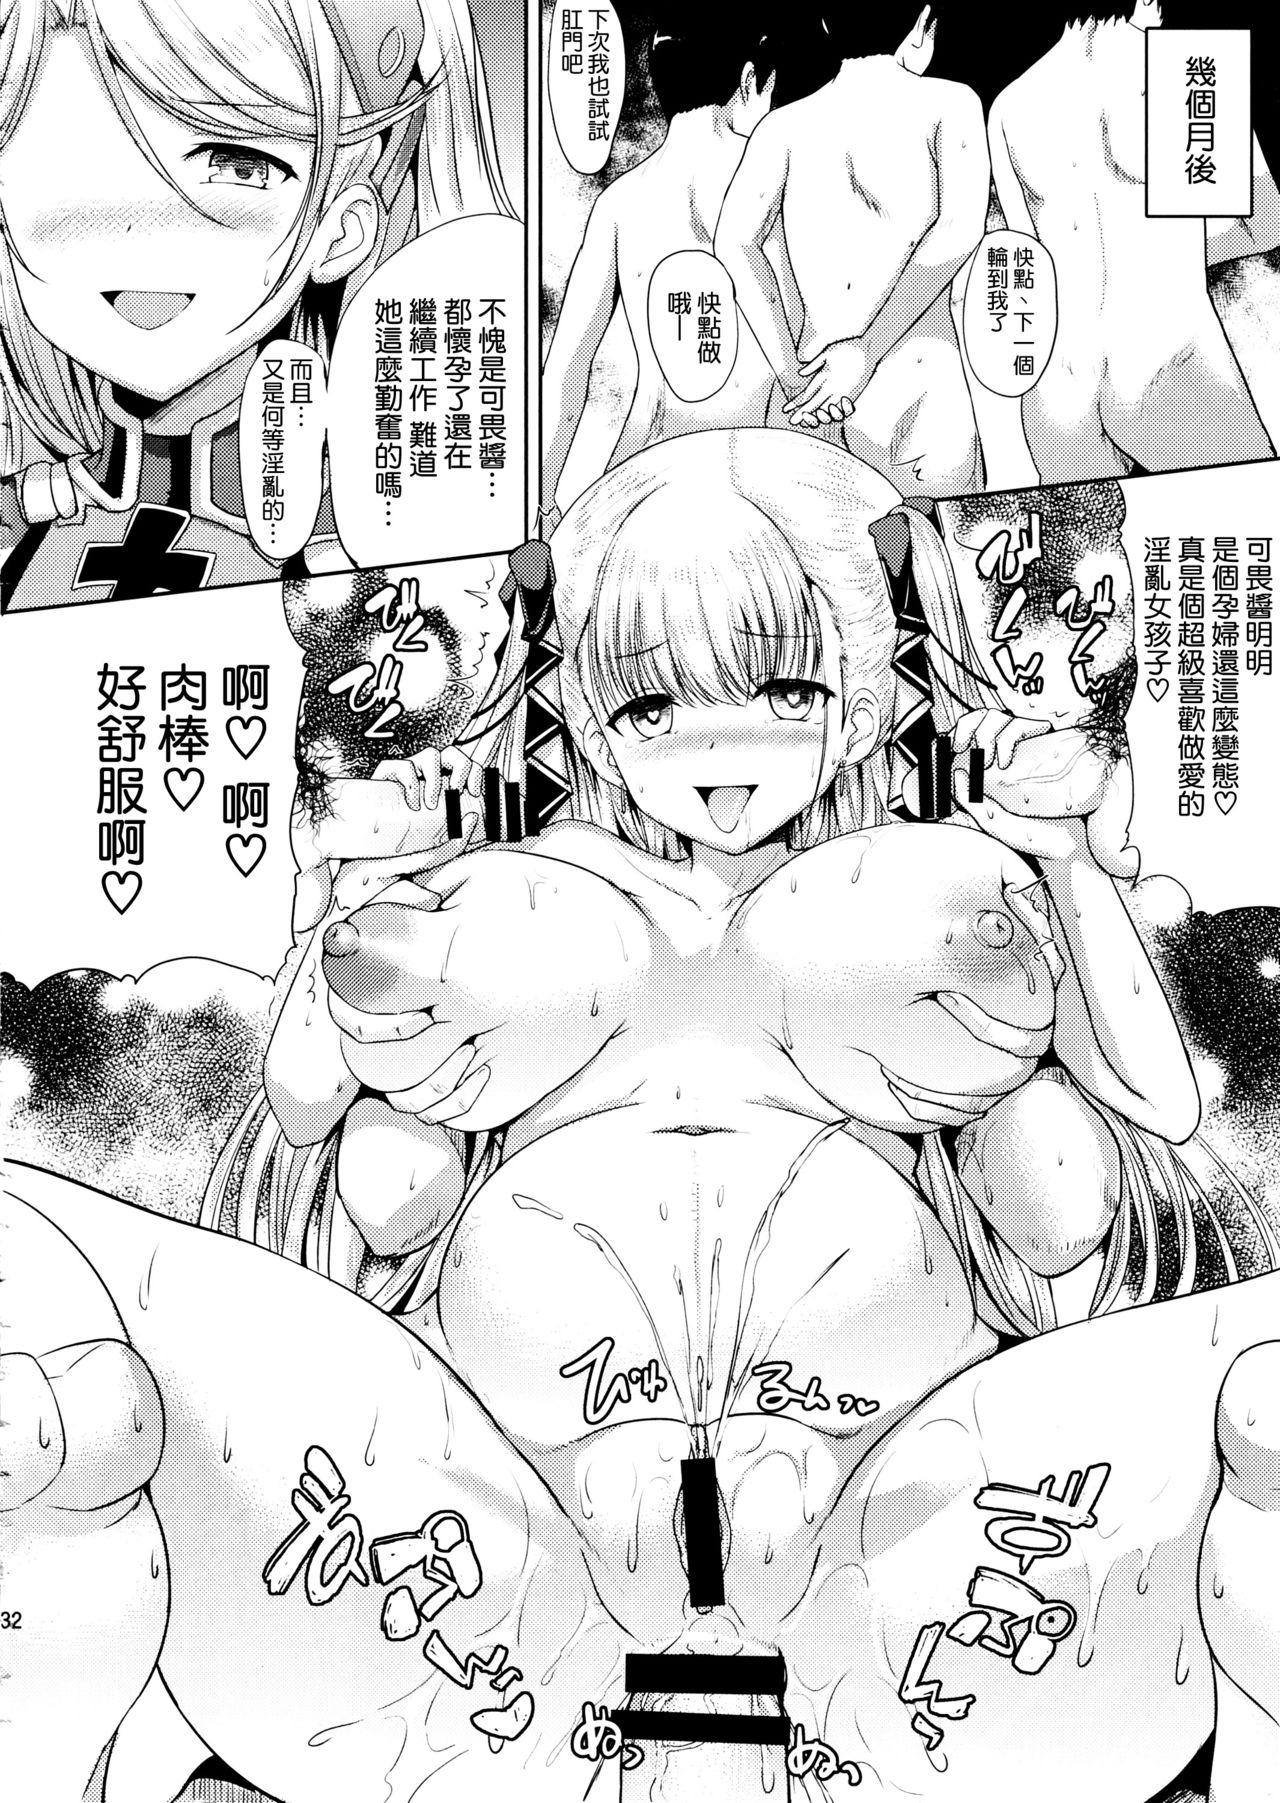 Formidable no Oppai ga Momitakute Shikataganai 31